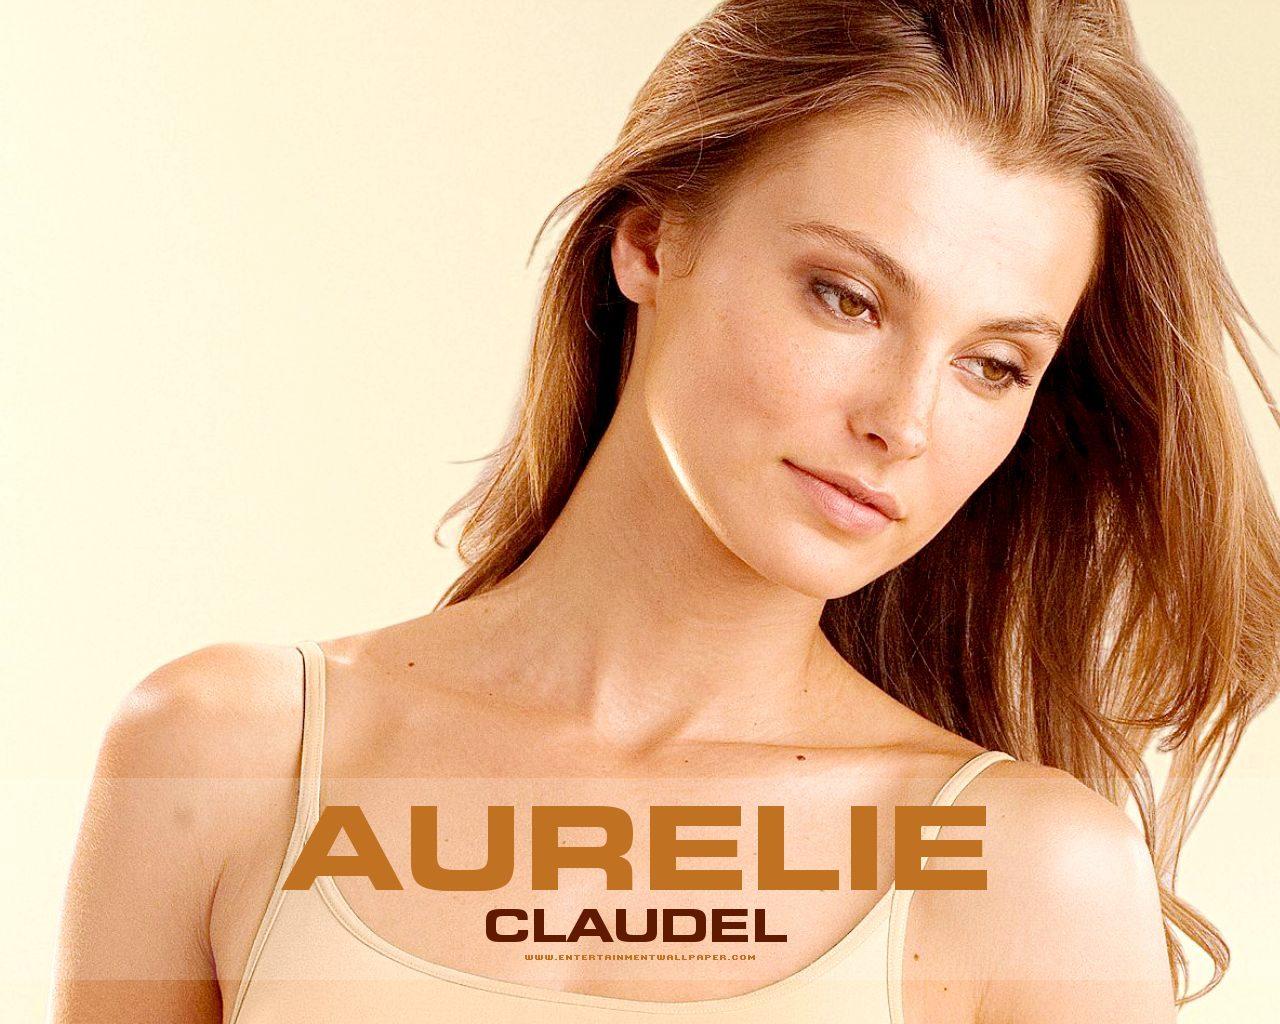 Aurelie claudel celebrity wallpapers emma stone - Celeb wallpapers ...